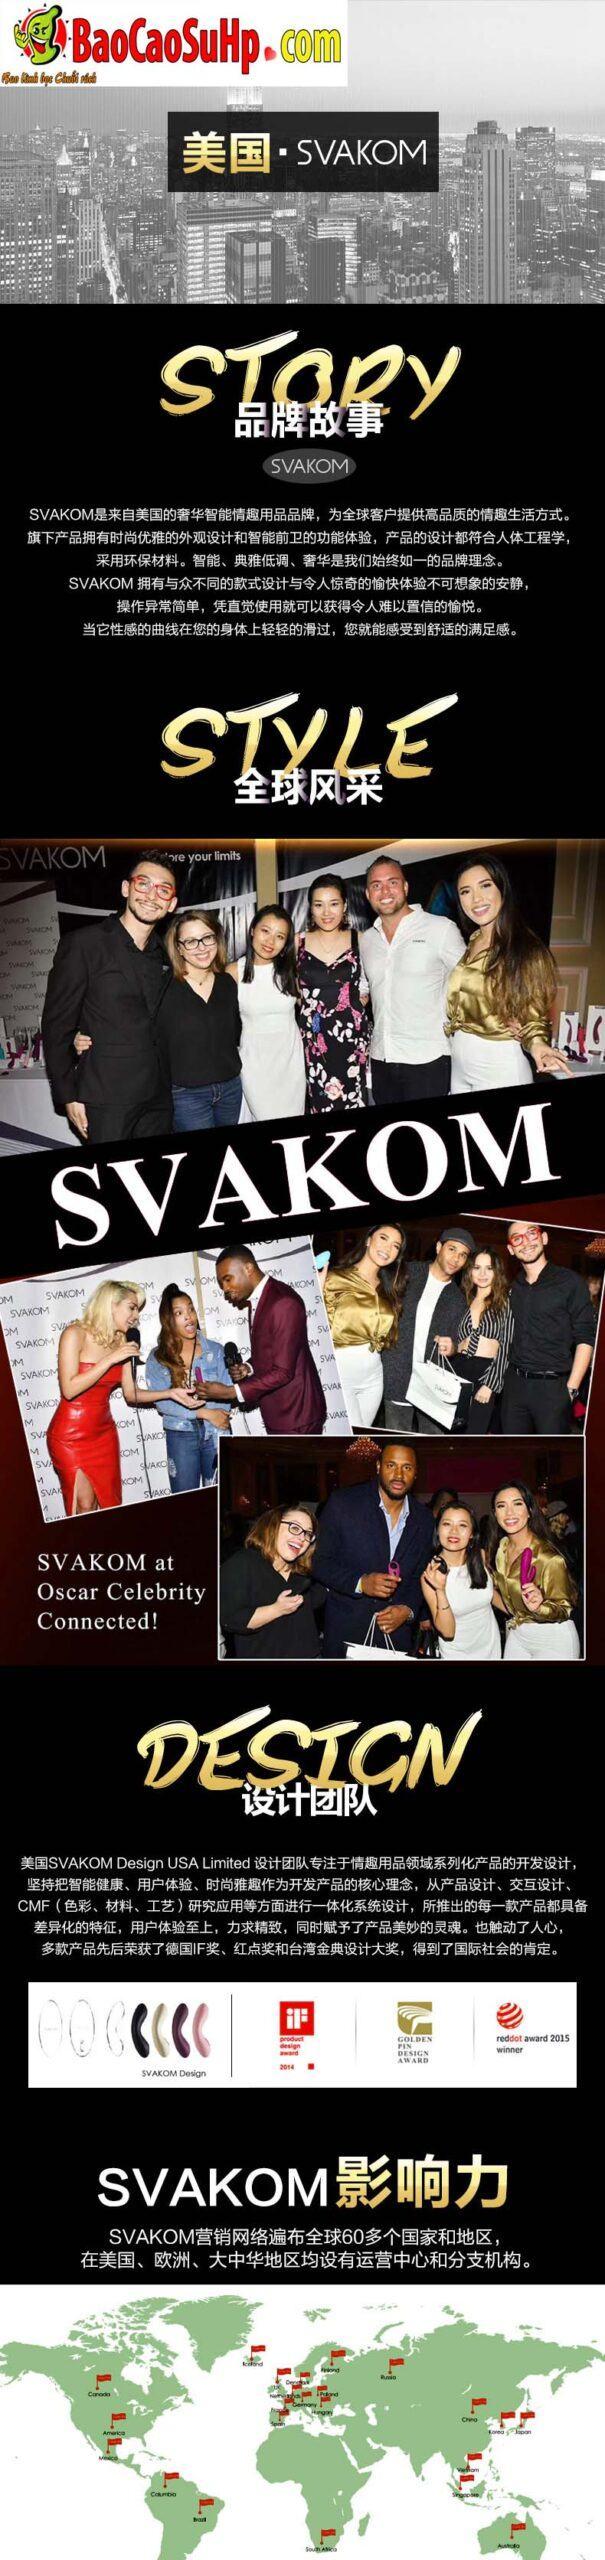 gel boi tron Svakom Orgasm Girl bia 19 scaled - Gel kích thích điểm G tăng khoái cảm Svakom Orgasm Girl